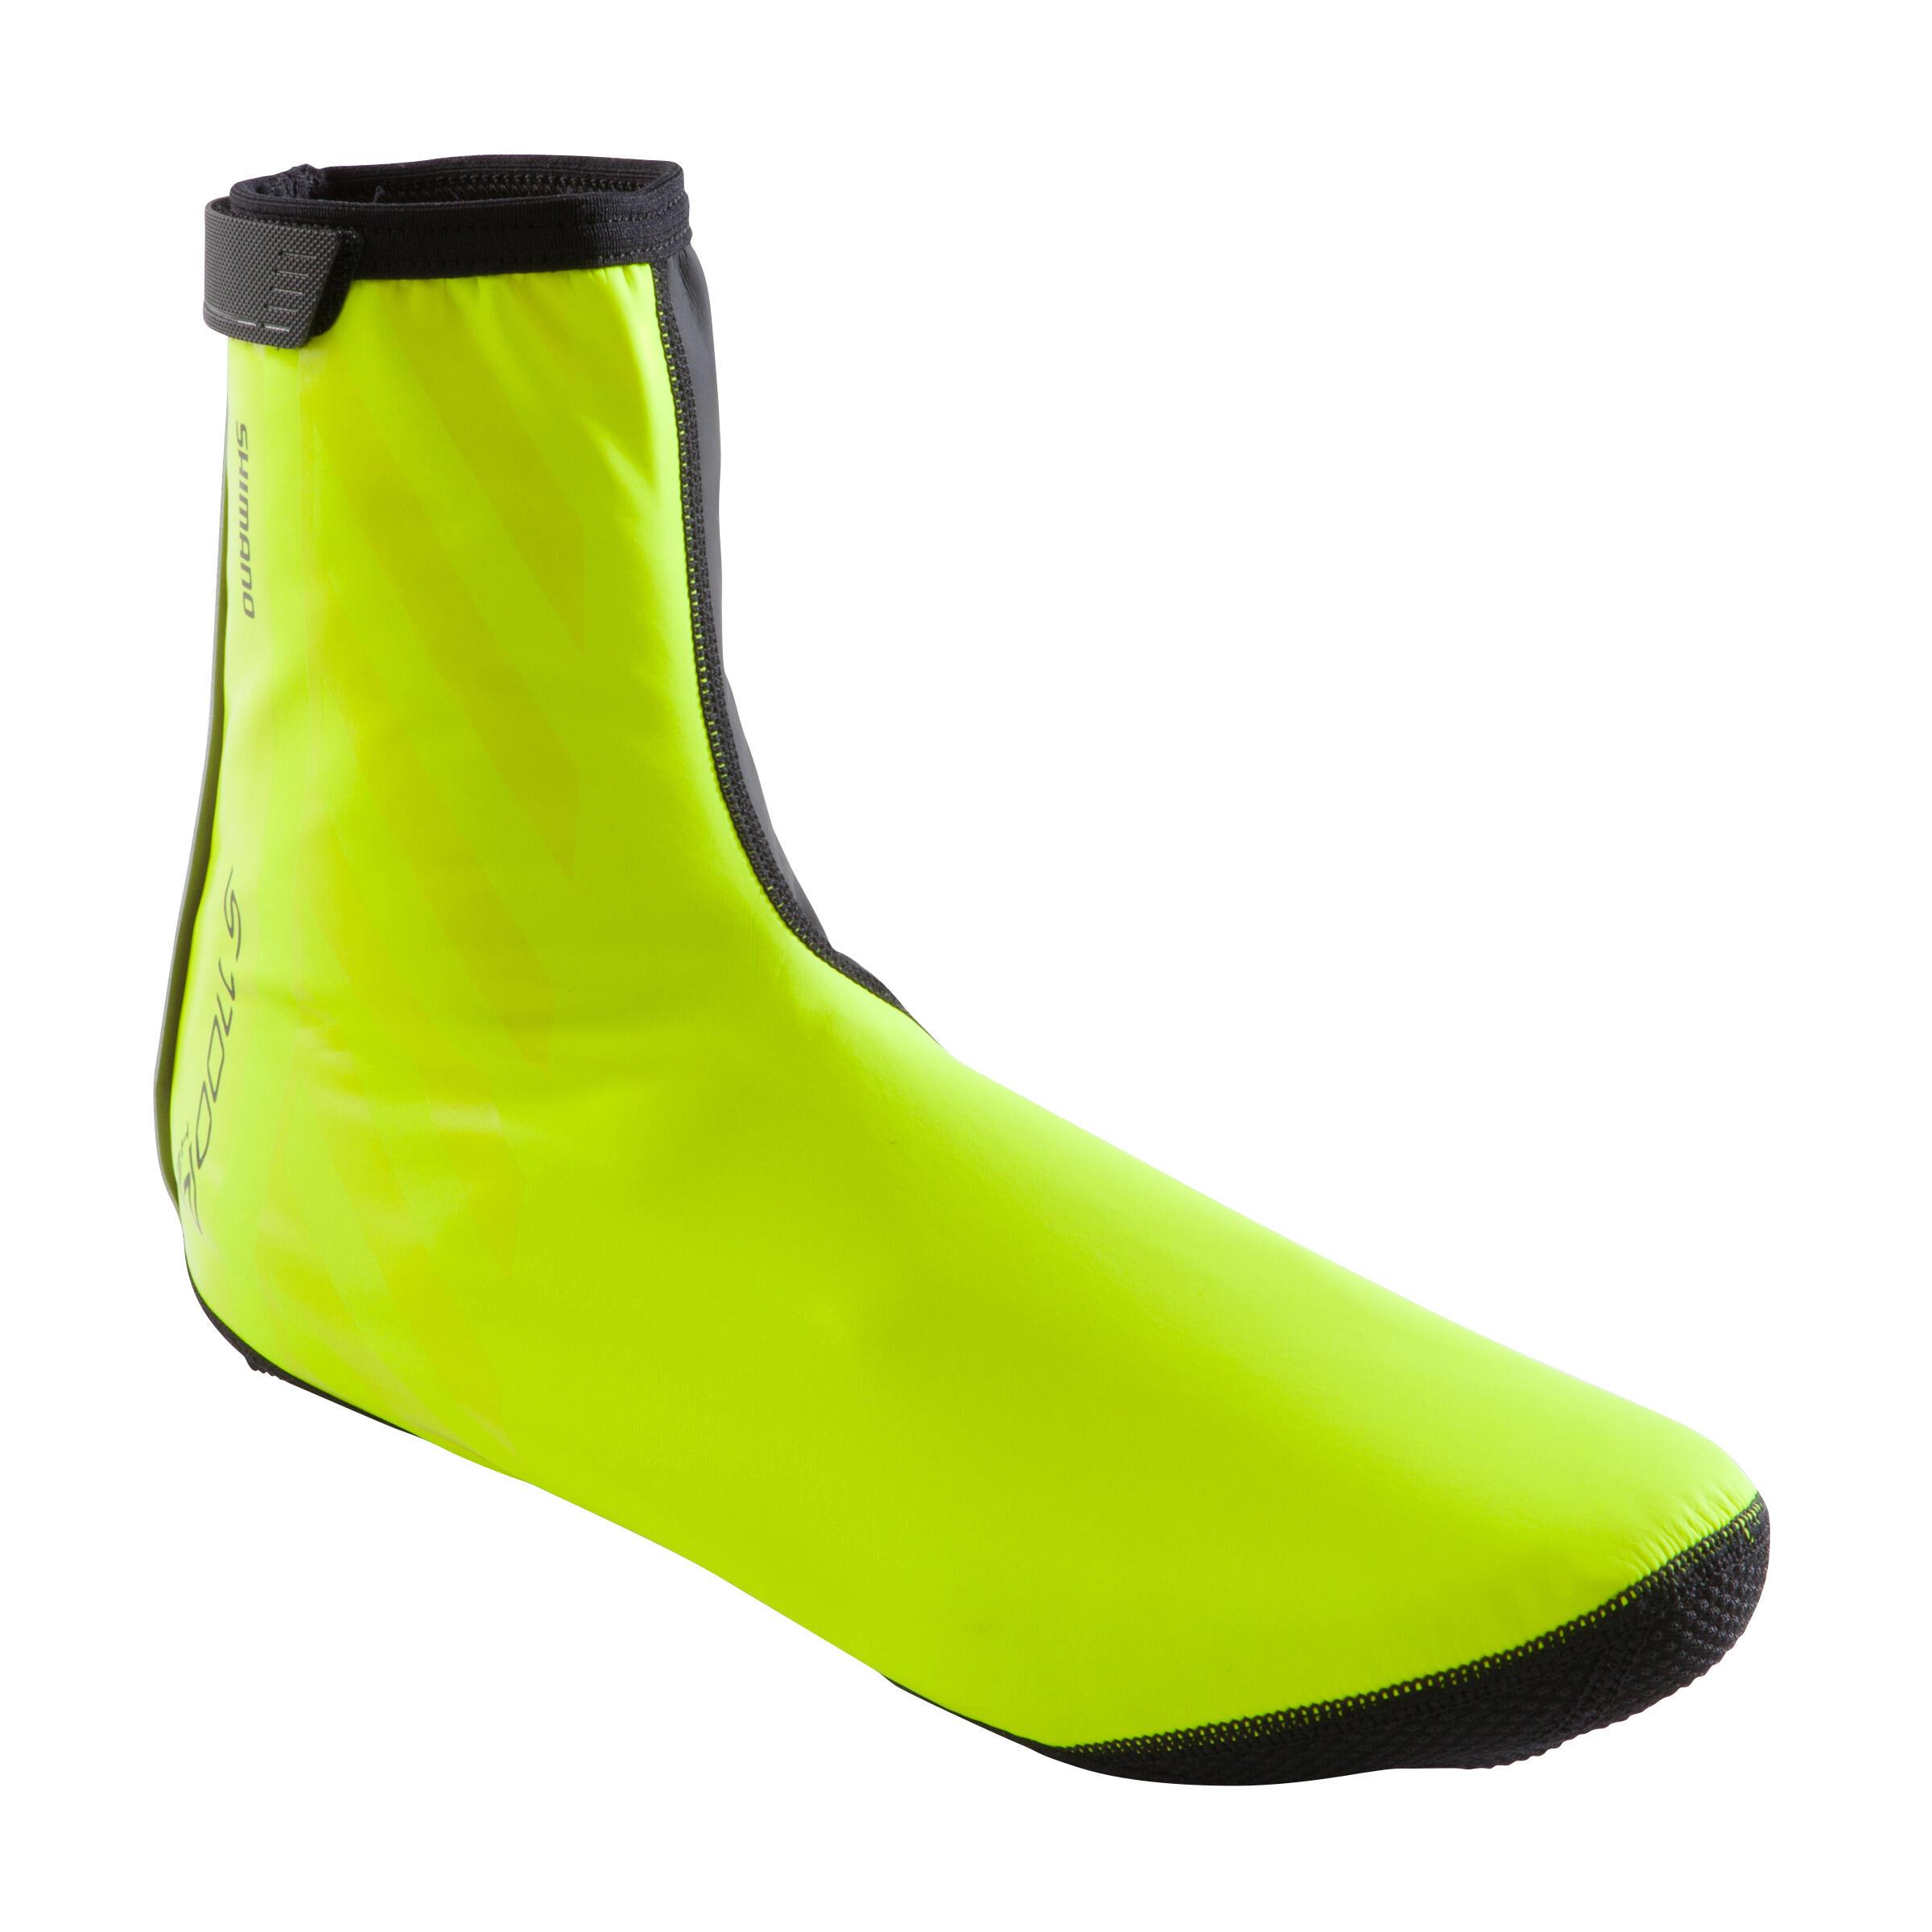 Fahrrad-Überschuhe S1100R H2O neongelb | Schuhe > Outdoorschuhe > Gamaschen | Gelb - Schwarz - Grau | Shimano